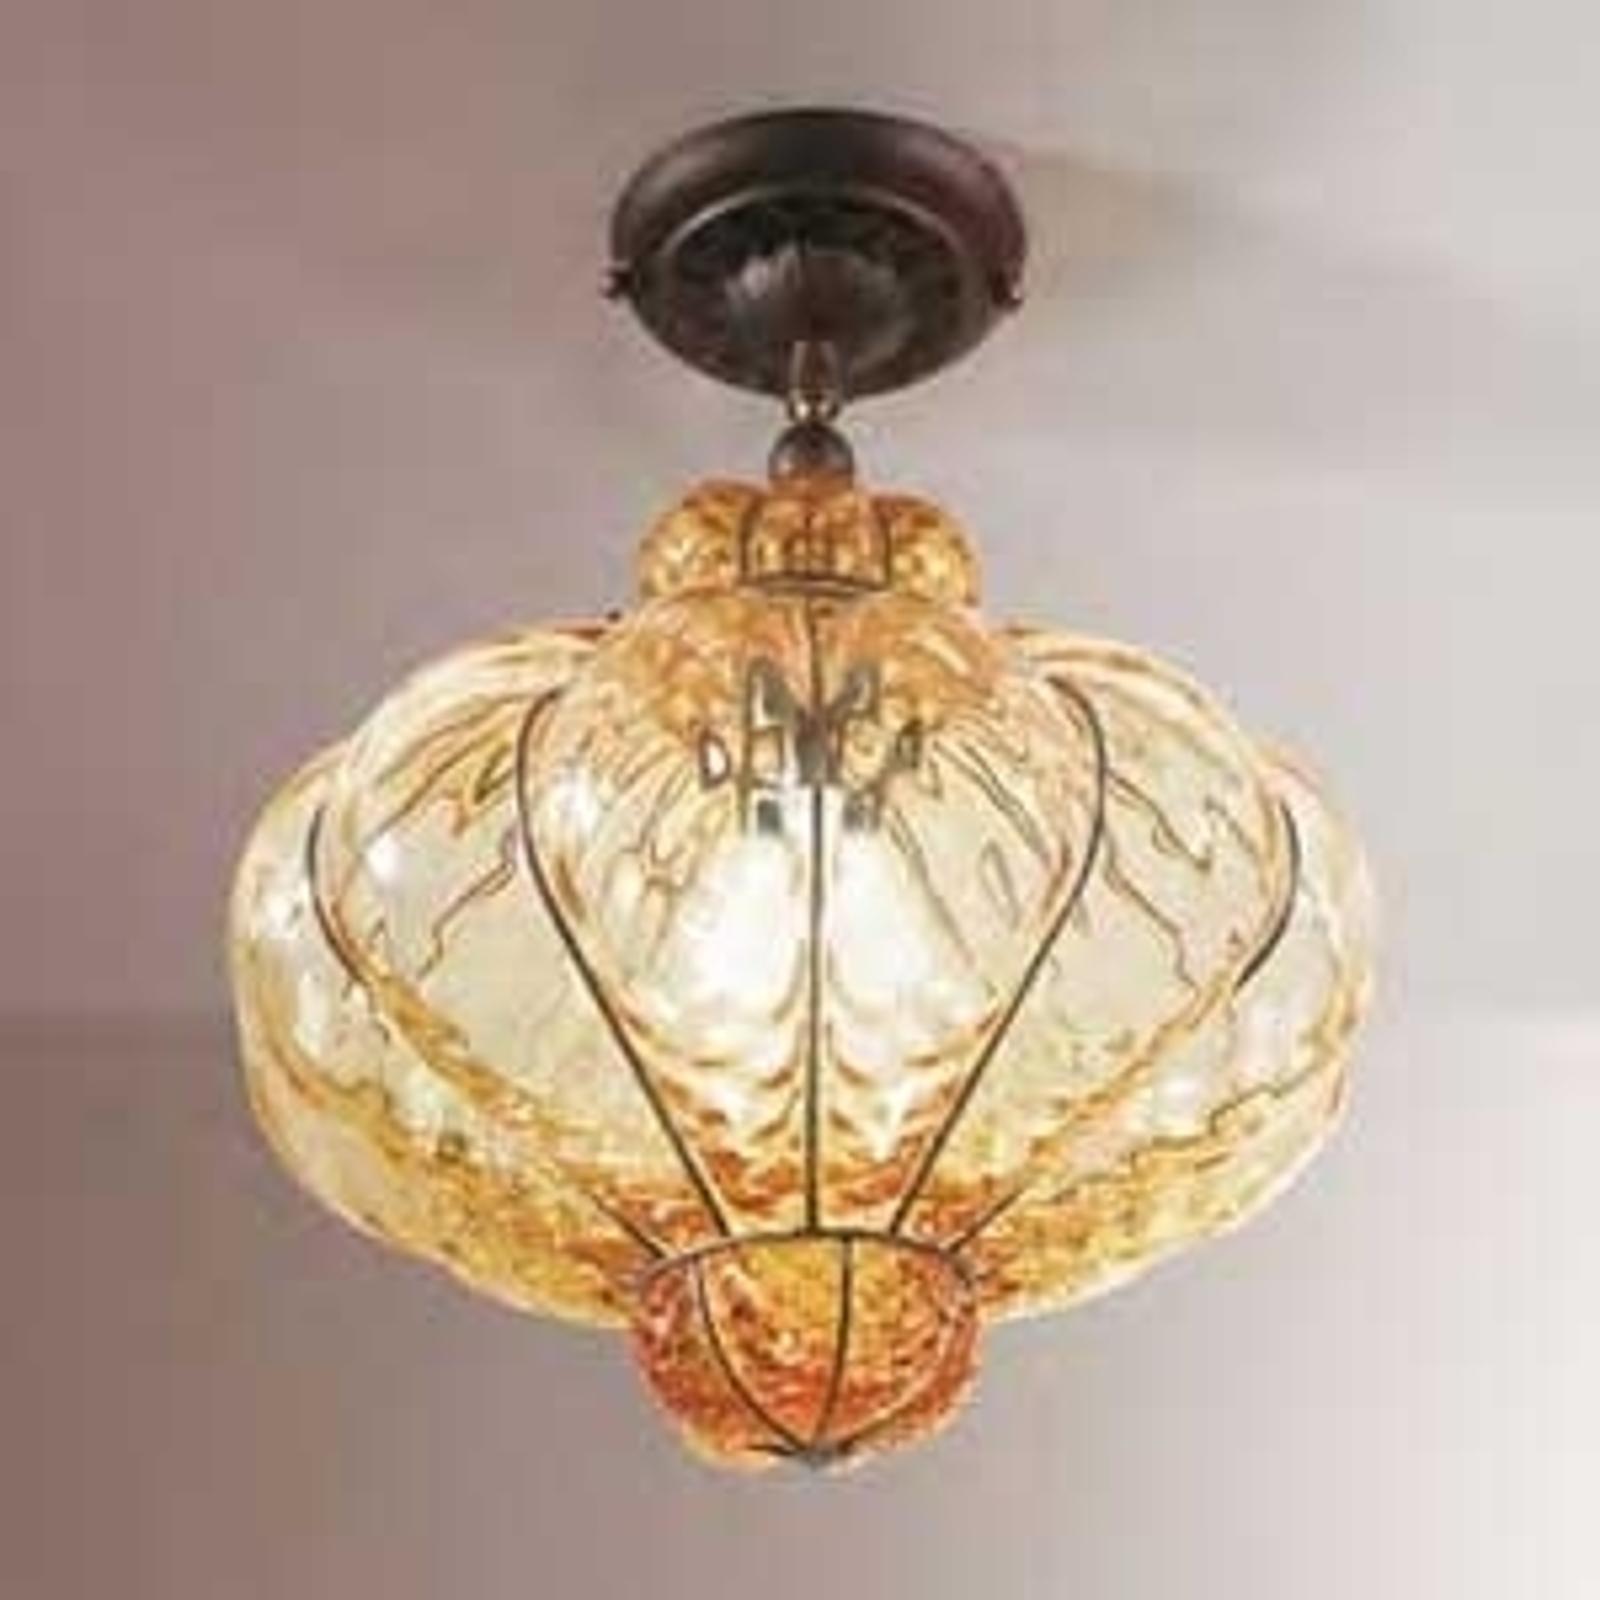 Lampa sufitowa SULTANO ze szkła Murano 42 cm